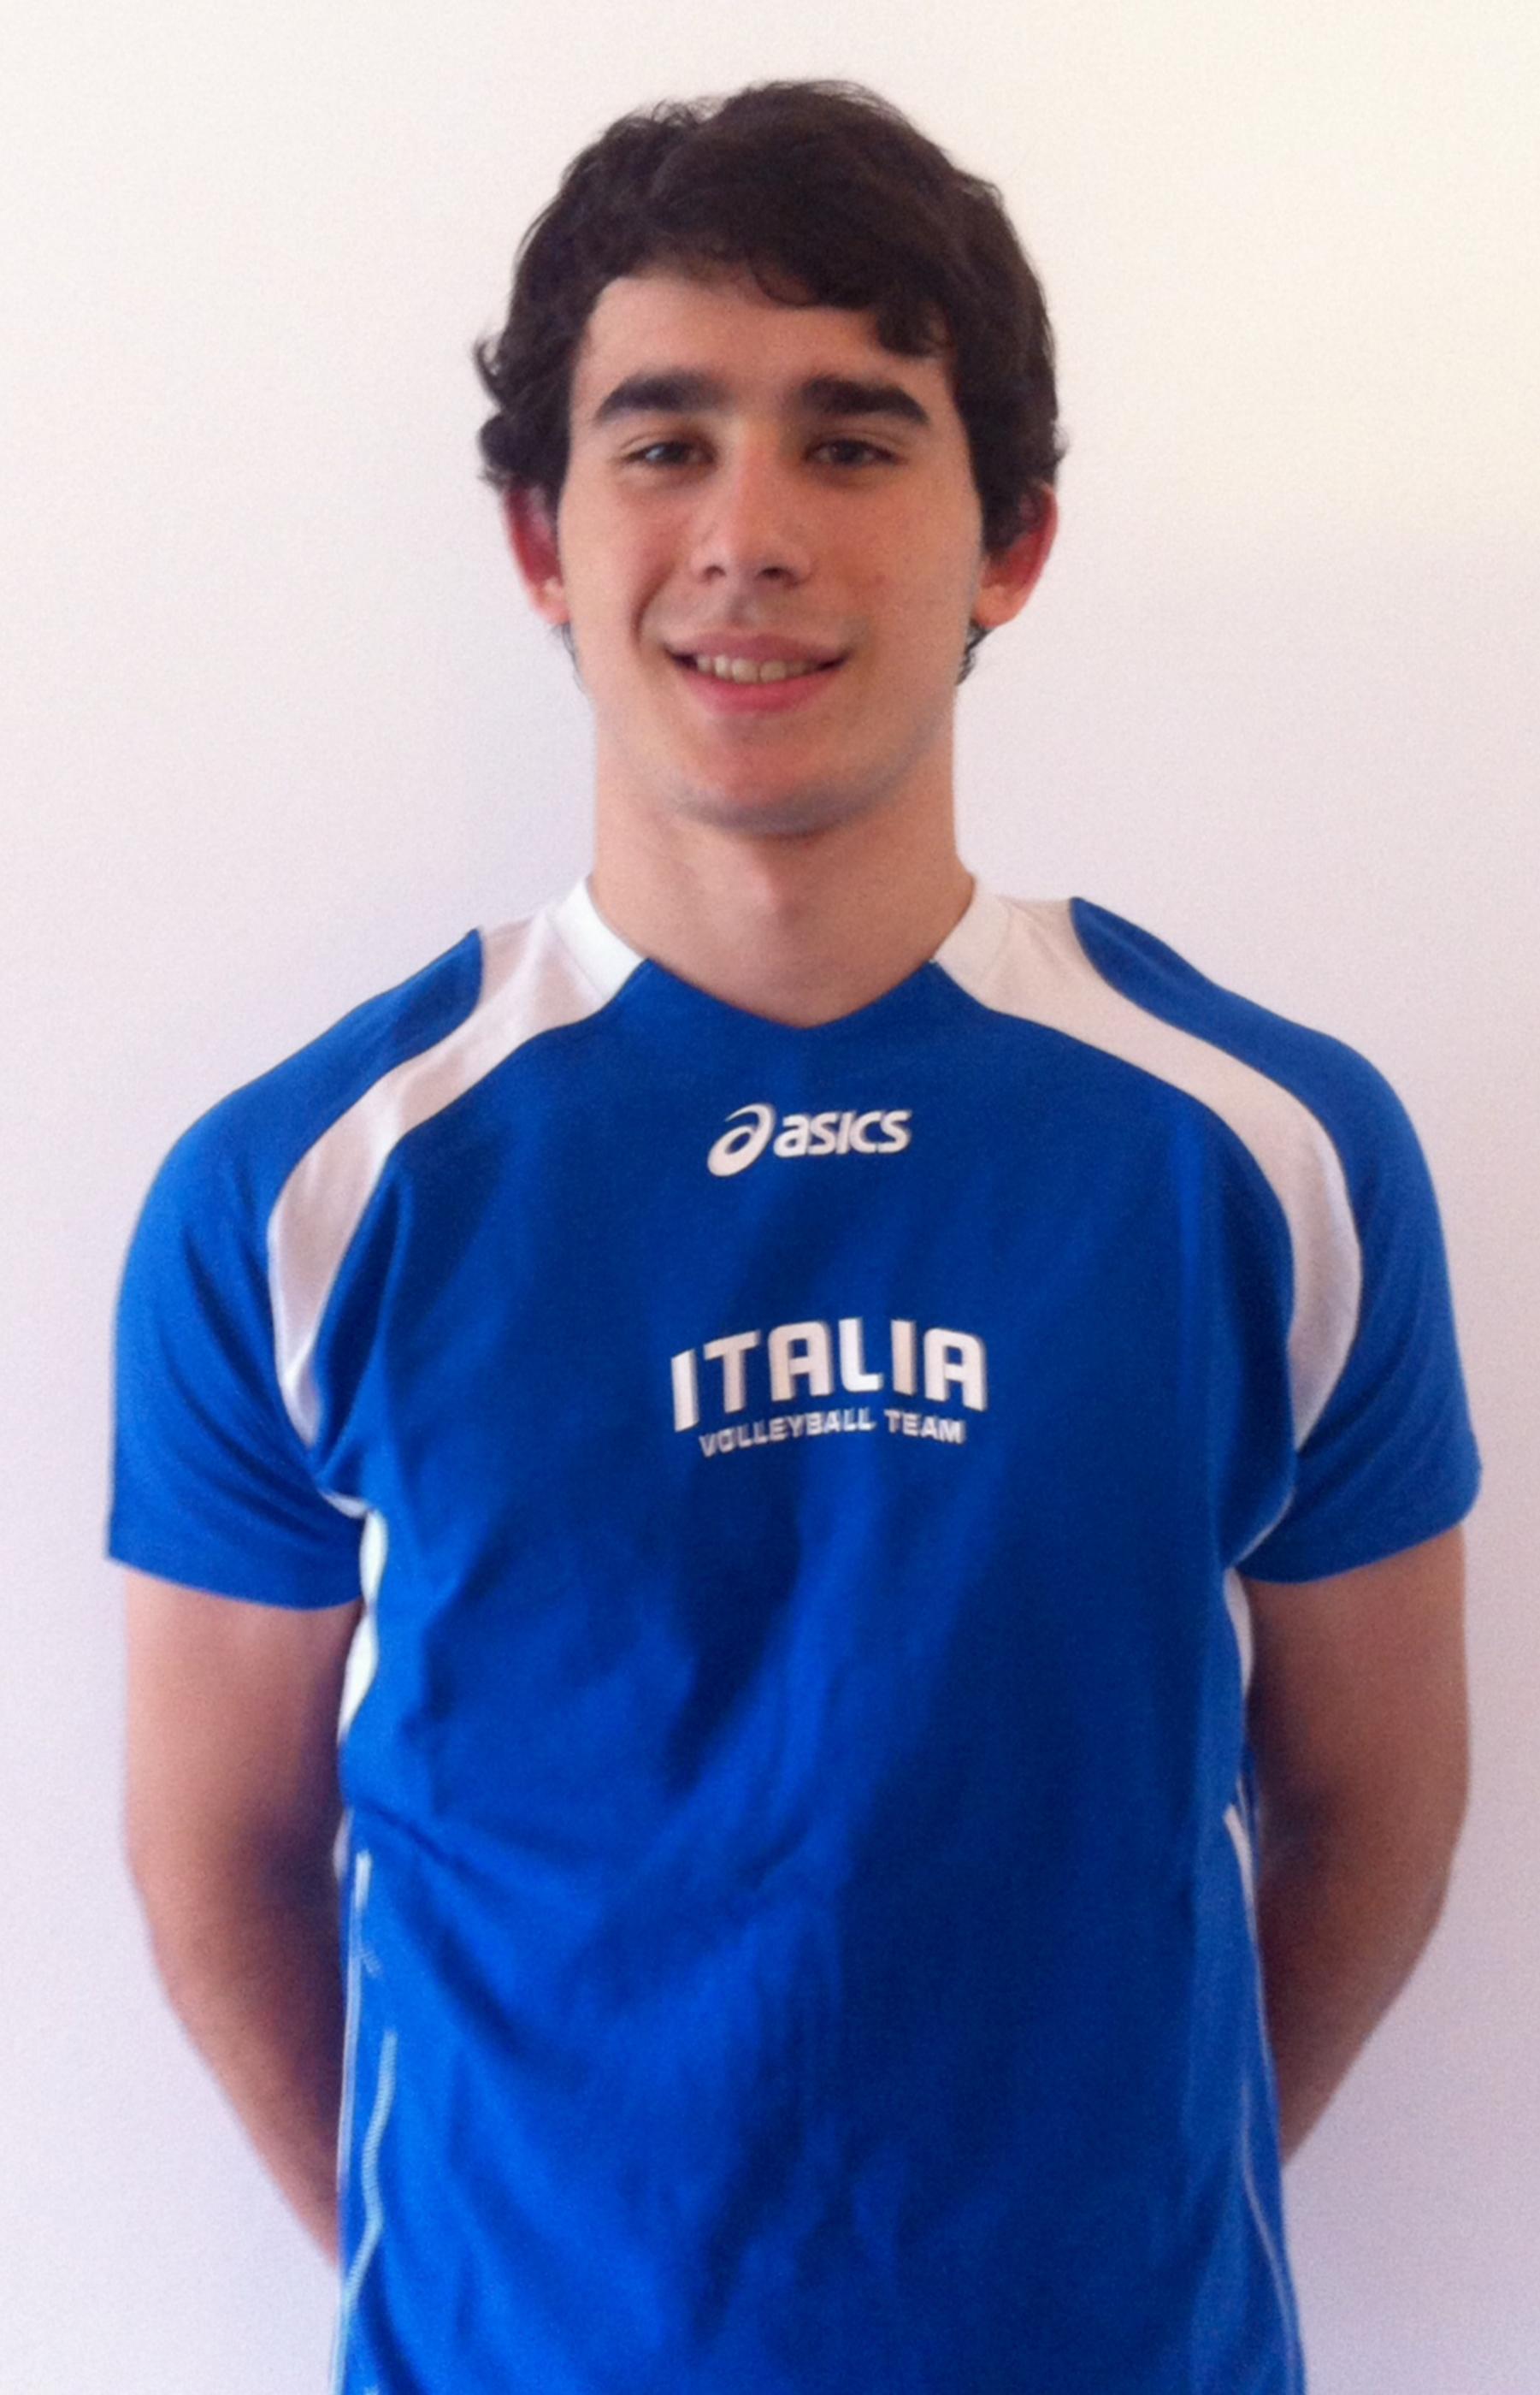 Gianluca Galassi